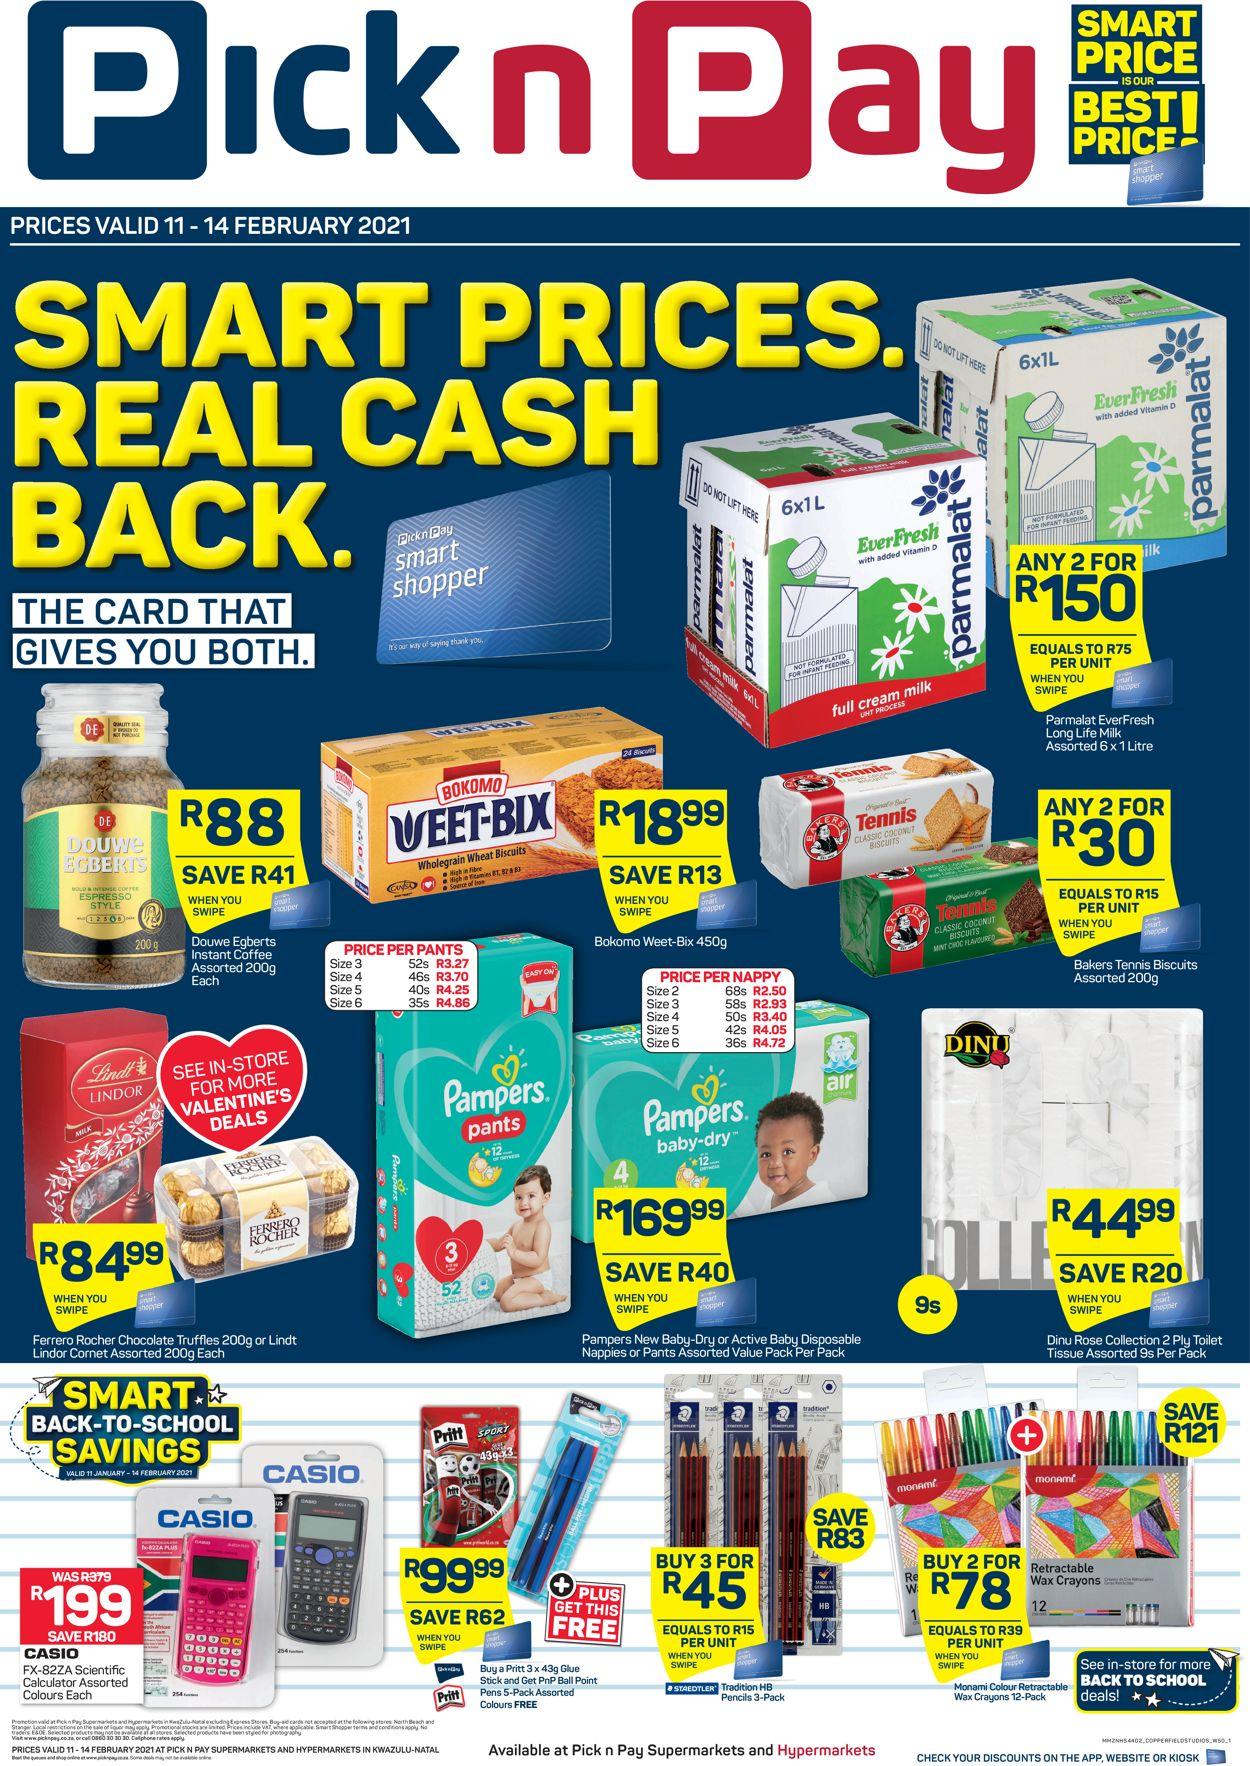 Pick n Pay Catalogue - 2021/02/11-2021/02/14